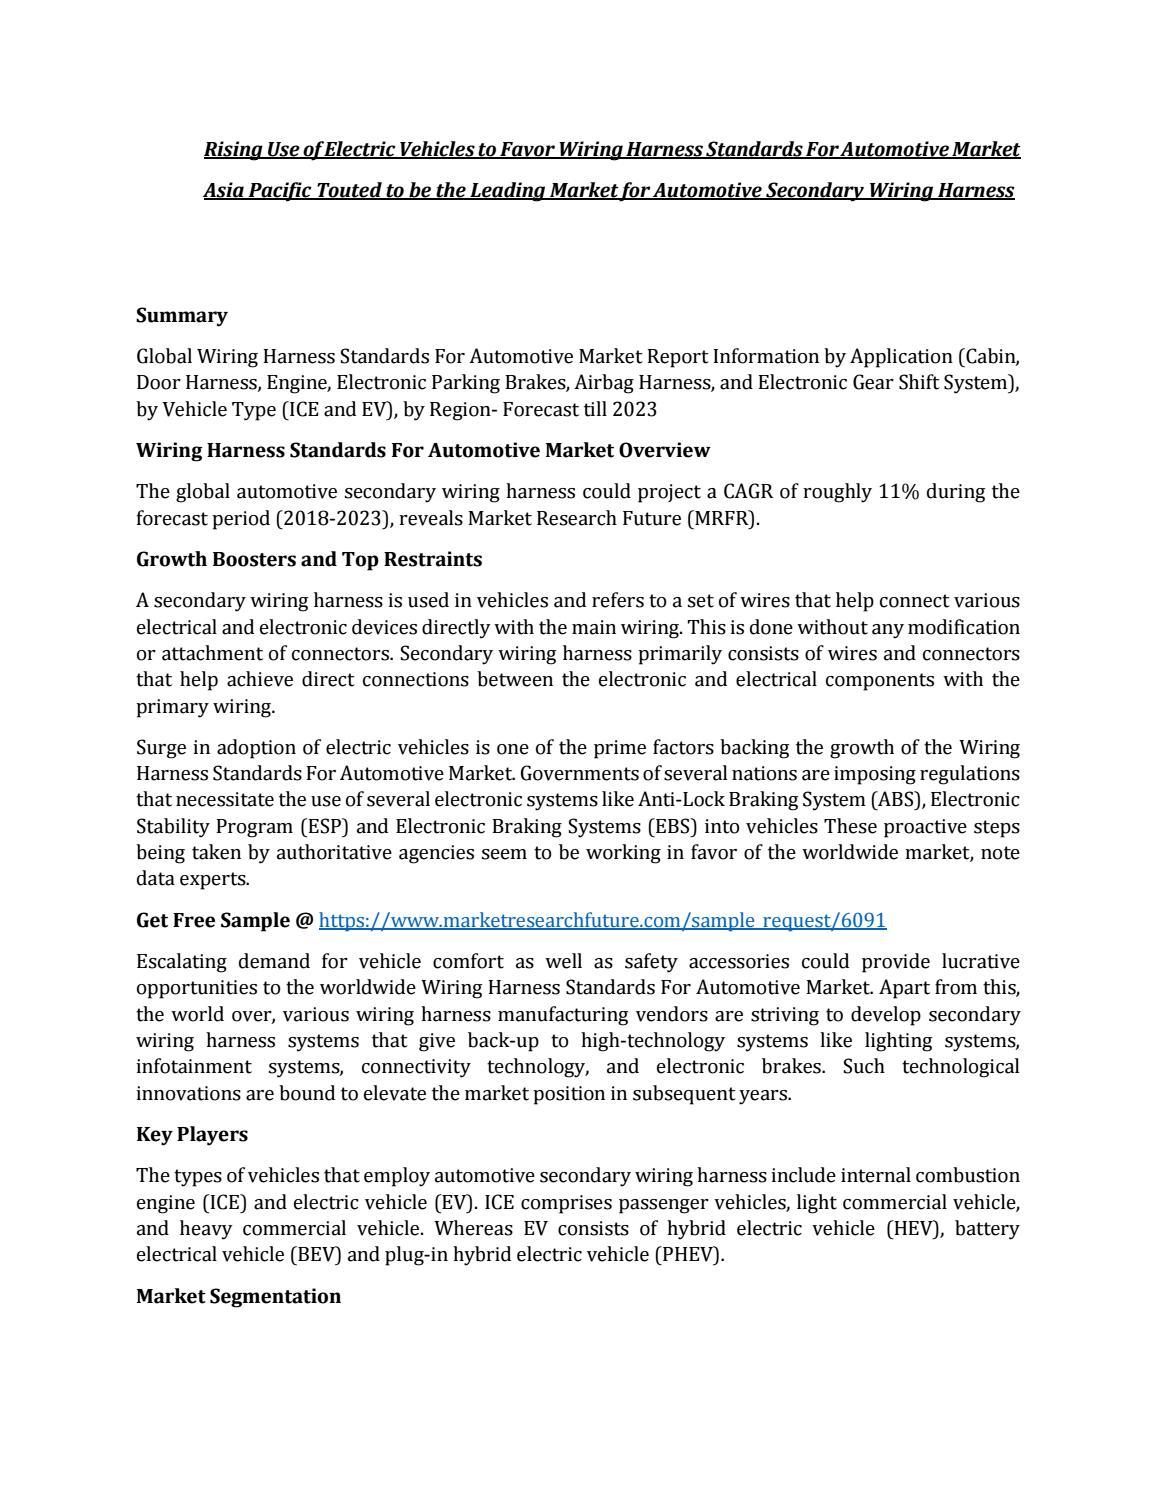 Wiring Harness Standards For Automotive by sakkk18 - issuuIssuu